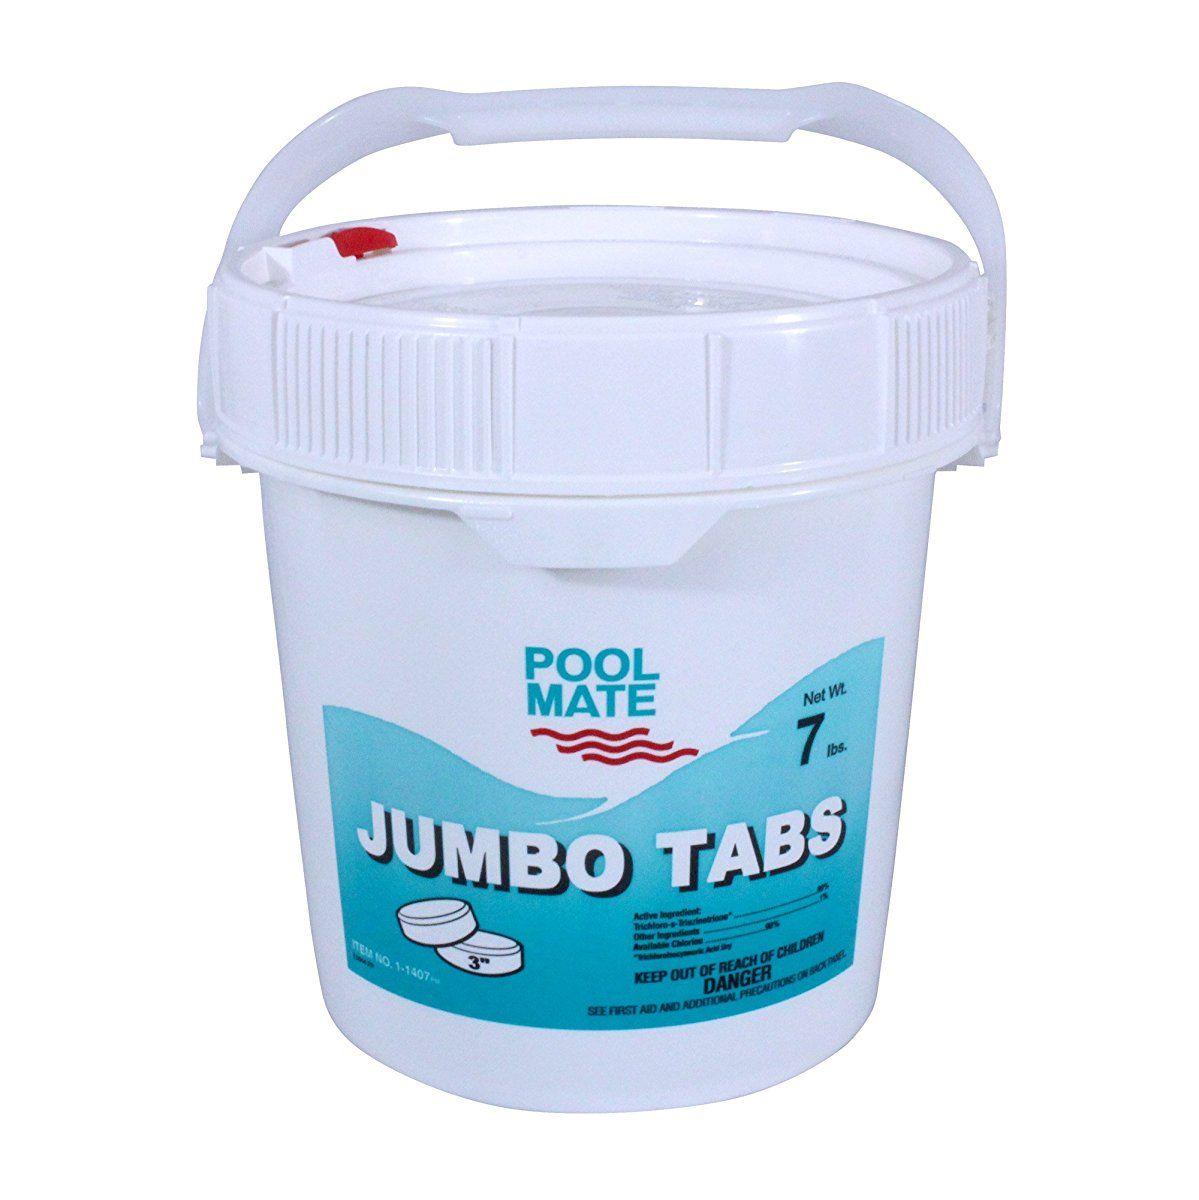 Pool Mate 11407 Jumbo 3Inch Chlorine Tablets, 7Pound